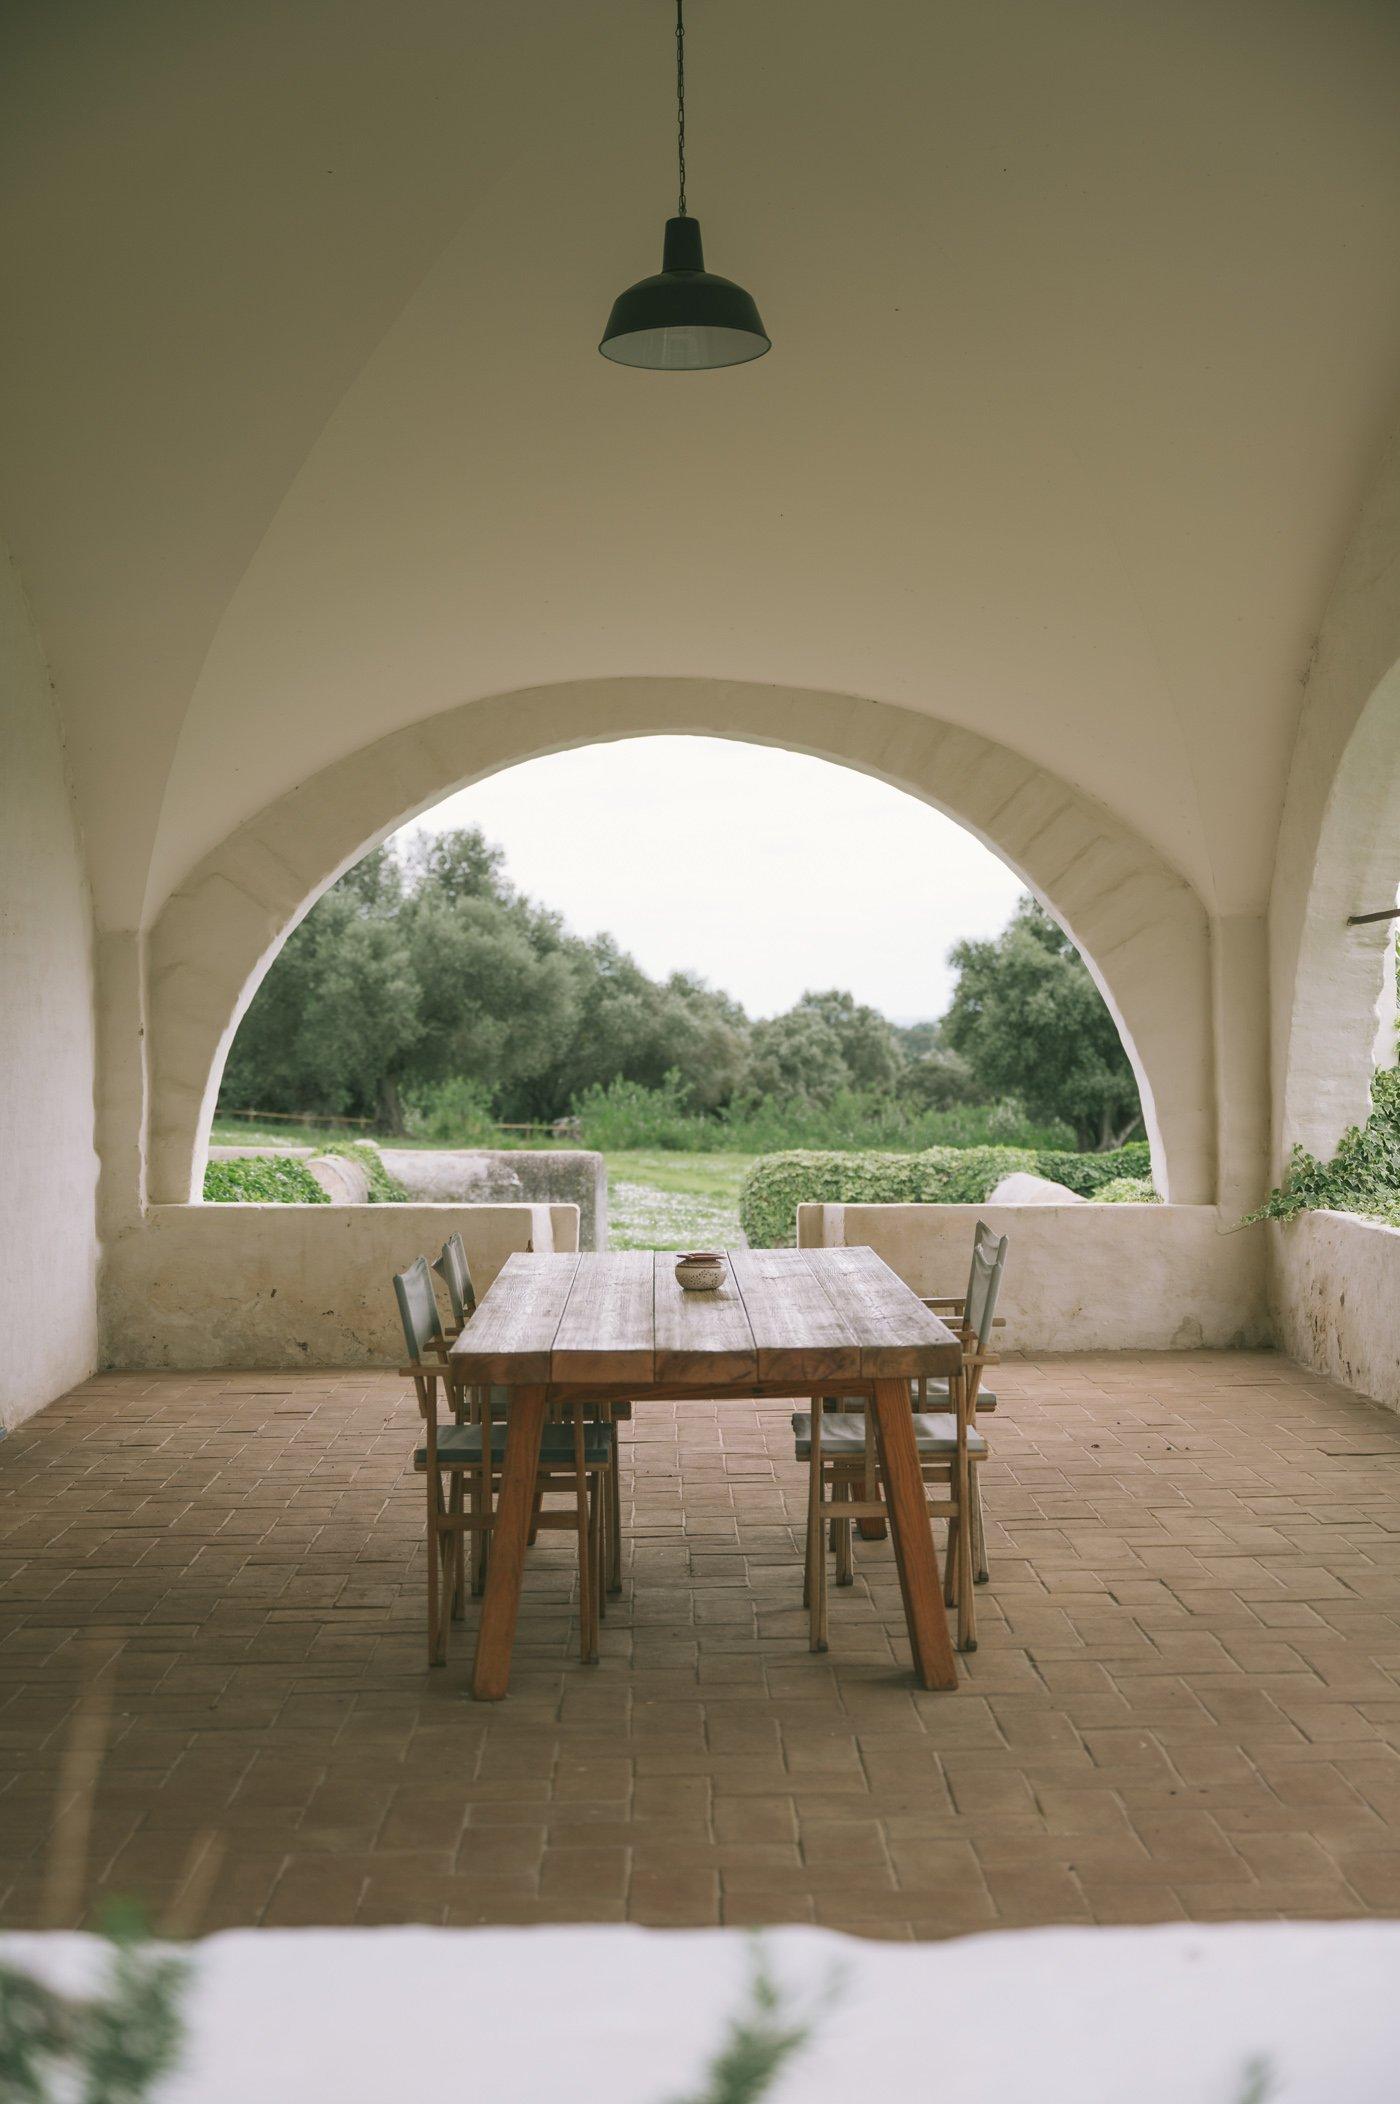 São Lourenço do Barrocal farmstay retreat in the Alentejo region of Portugal